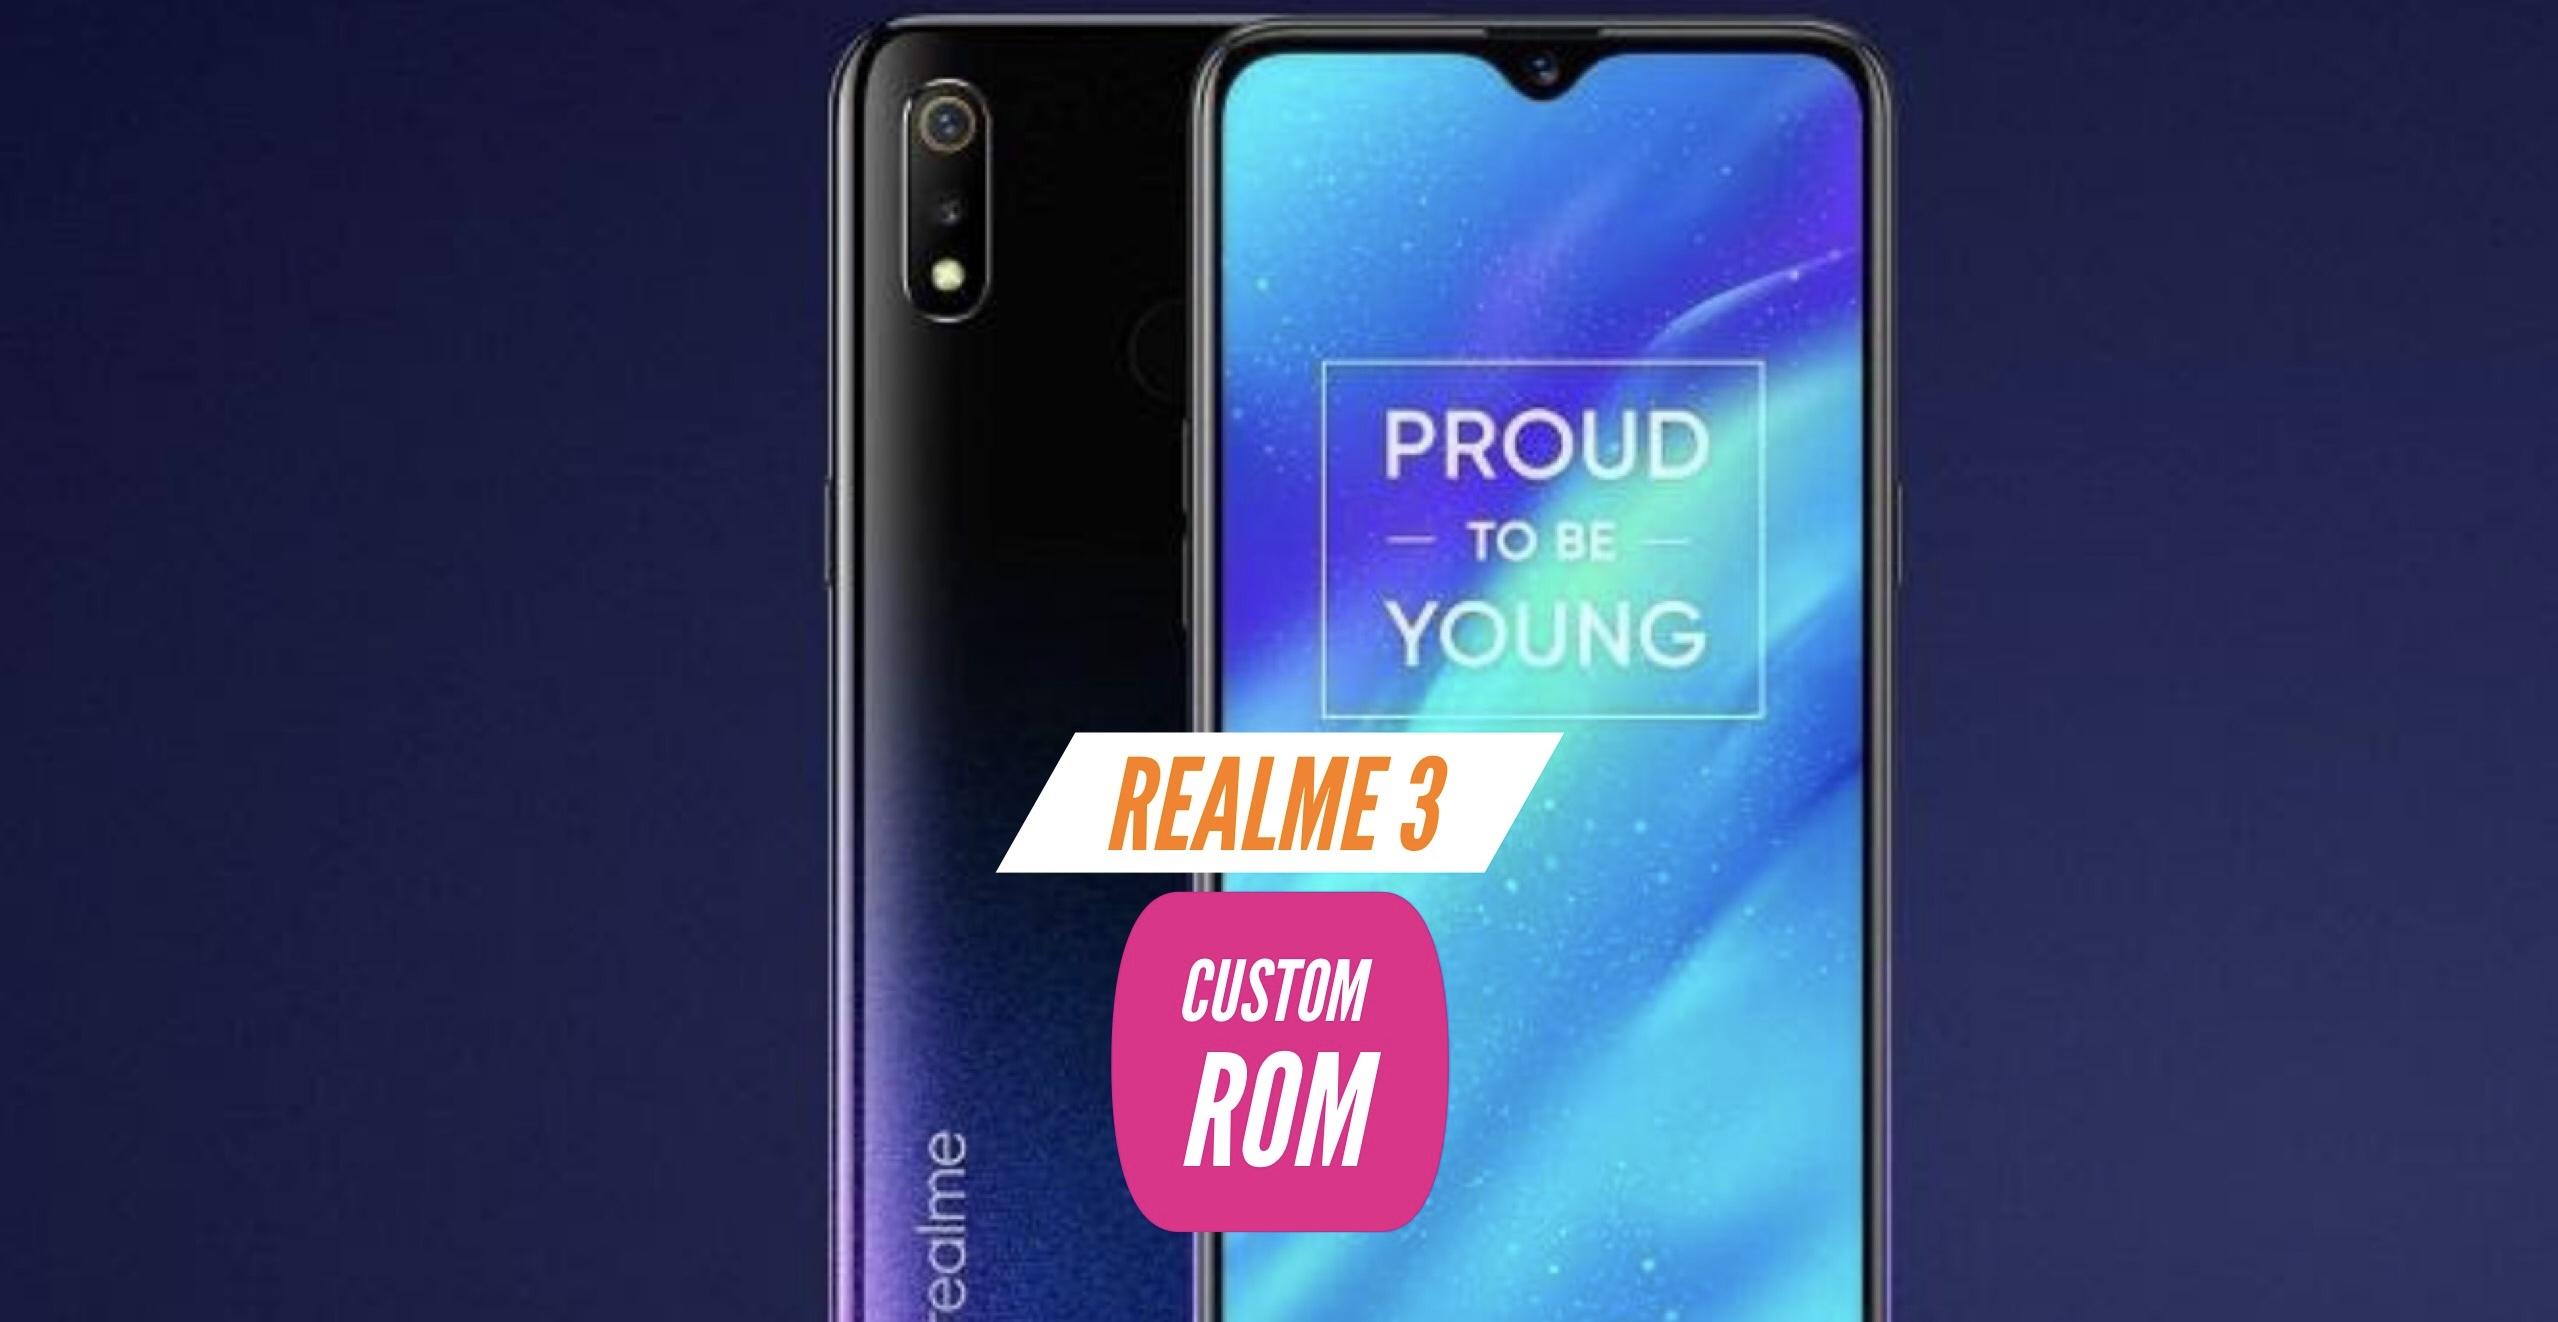 Realme 3 Custom ROM Installation - Two Easy METHODS!